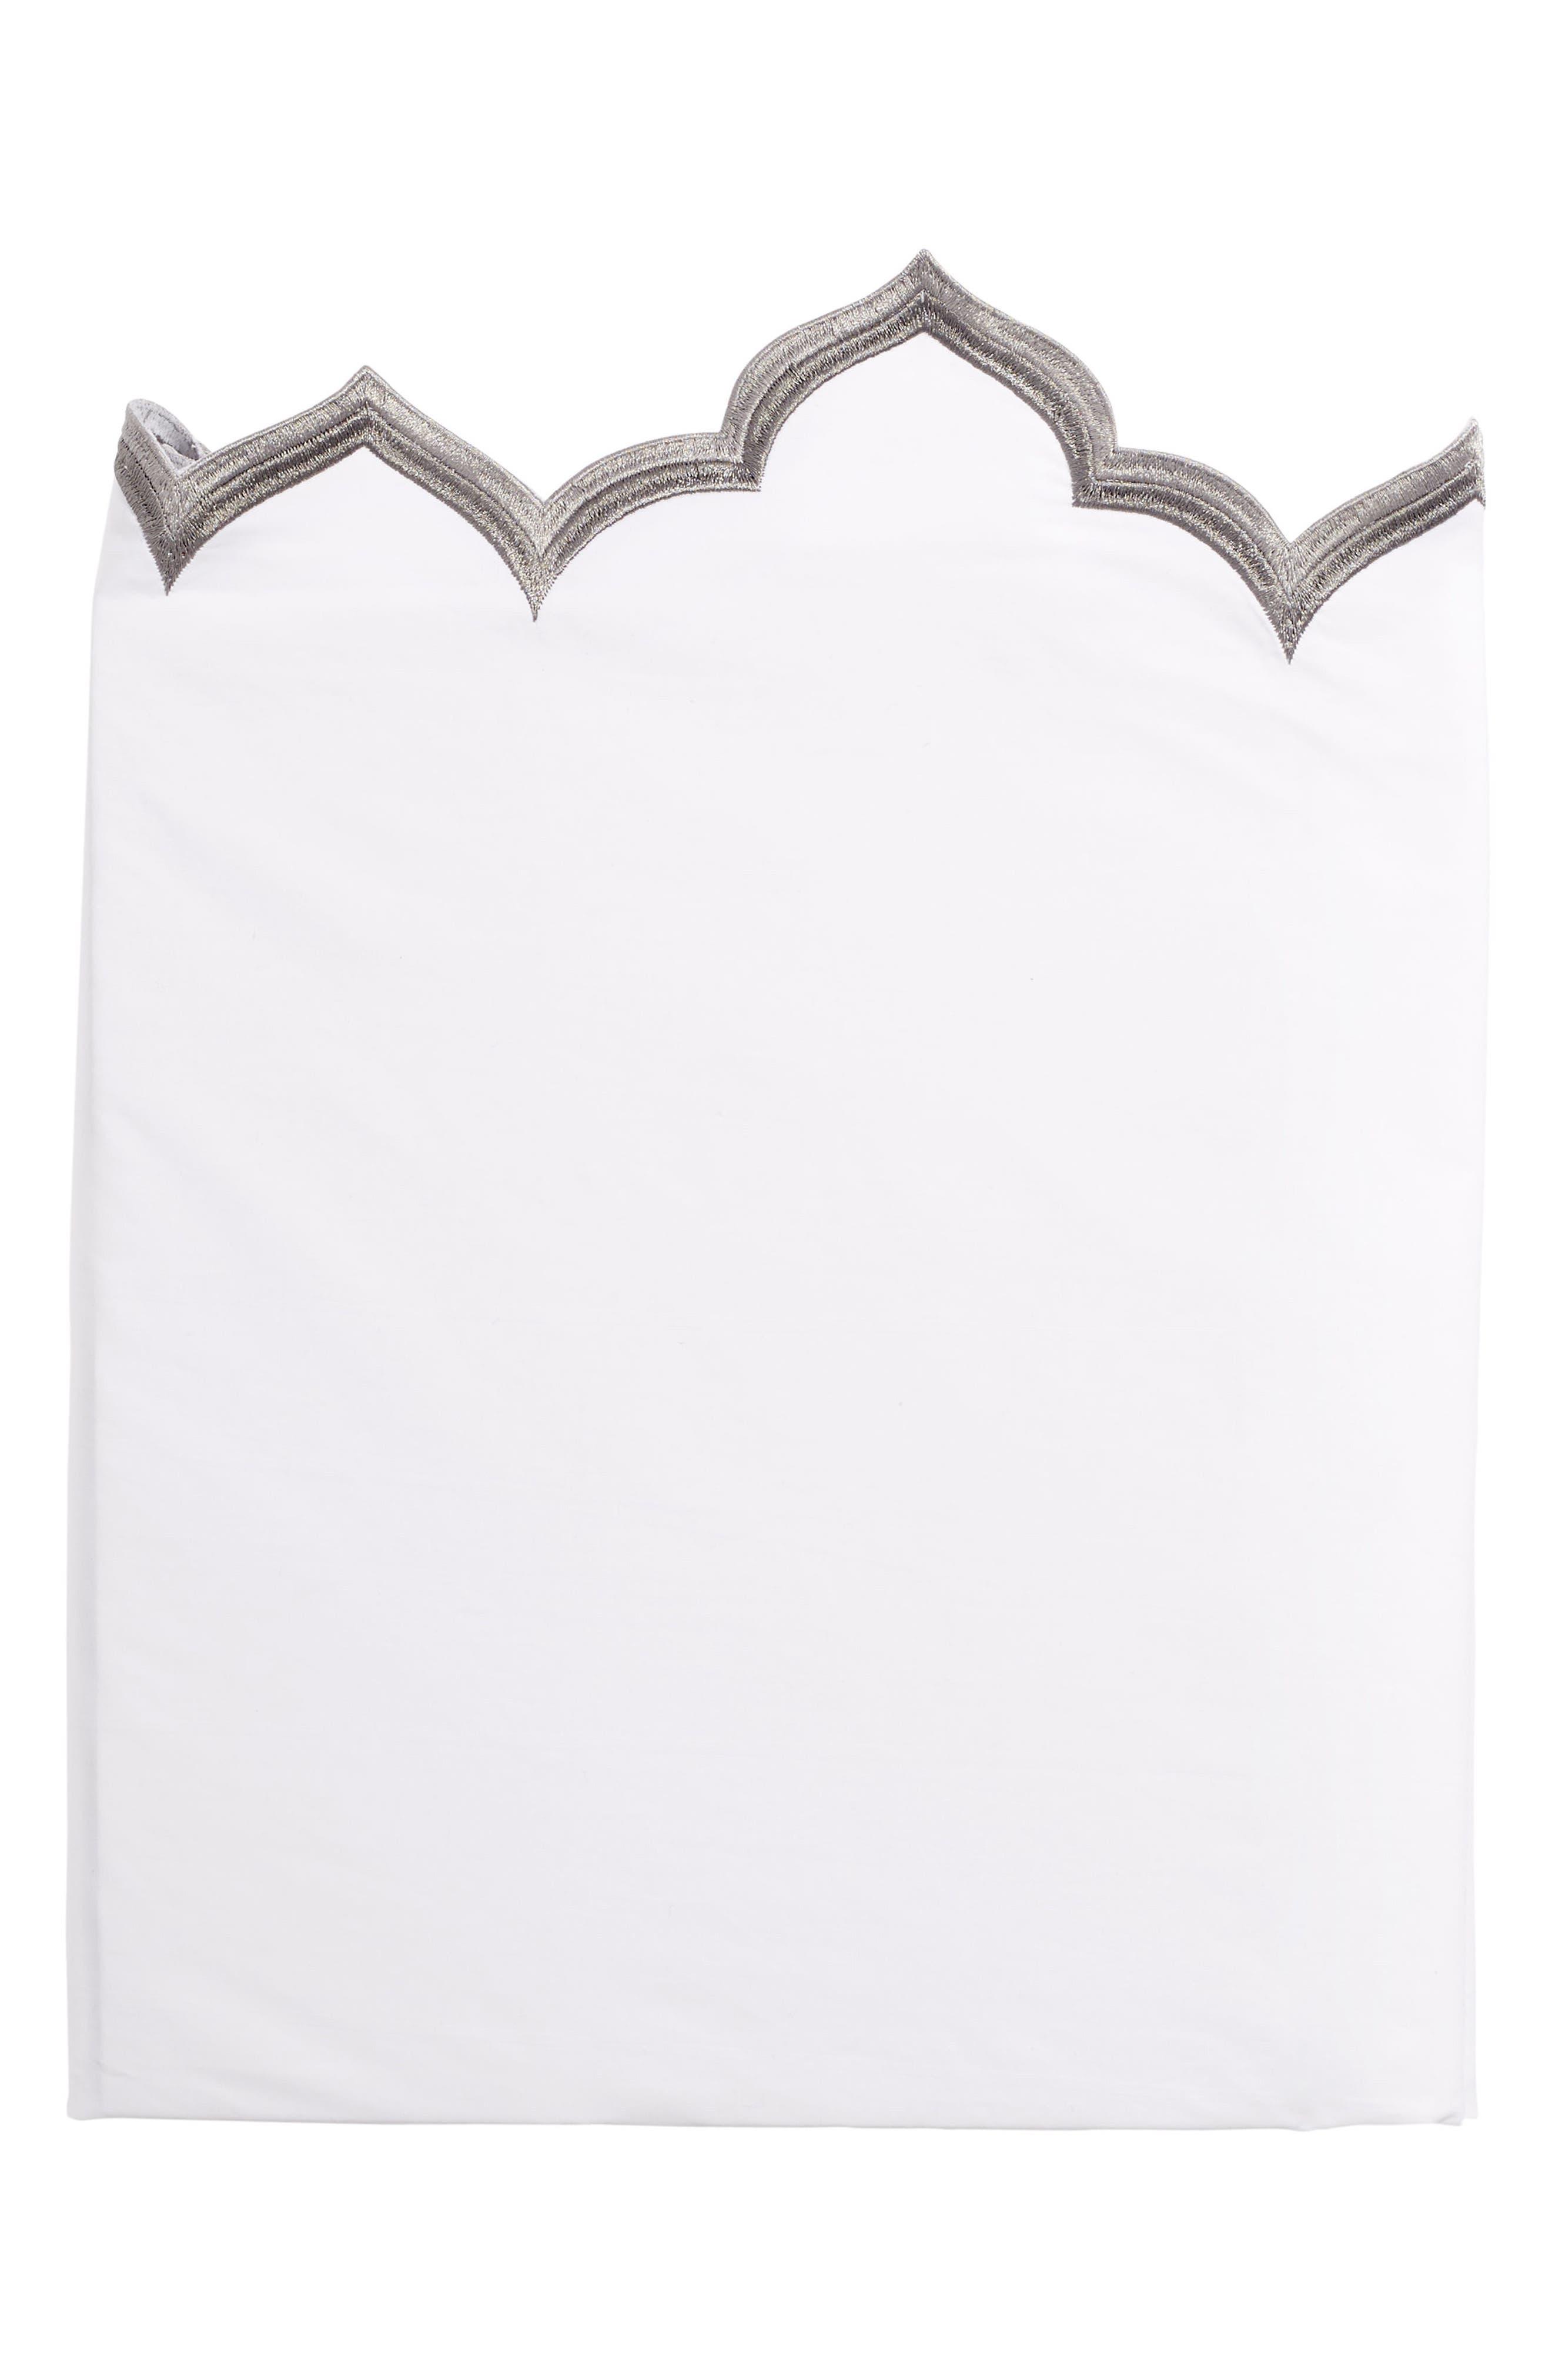 Sakuna 300 Thread Count Flat Sheet,                             Main thumbnail 1, color,                             White/ Gray